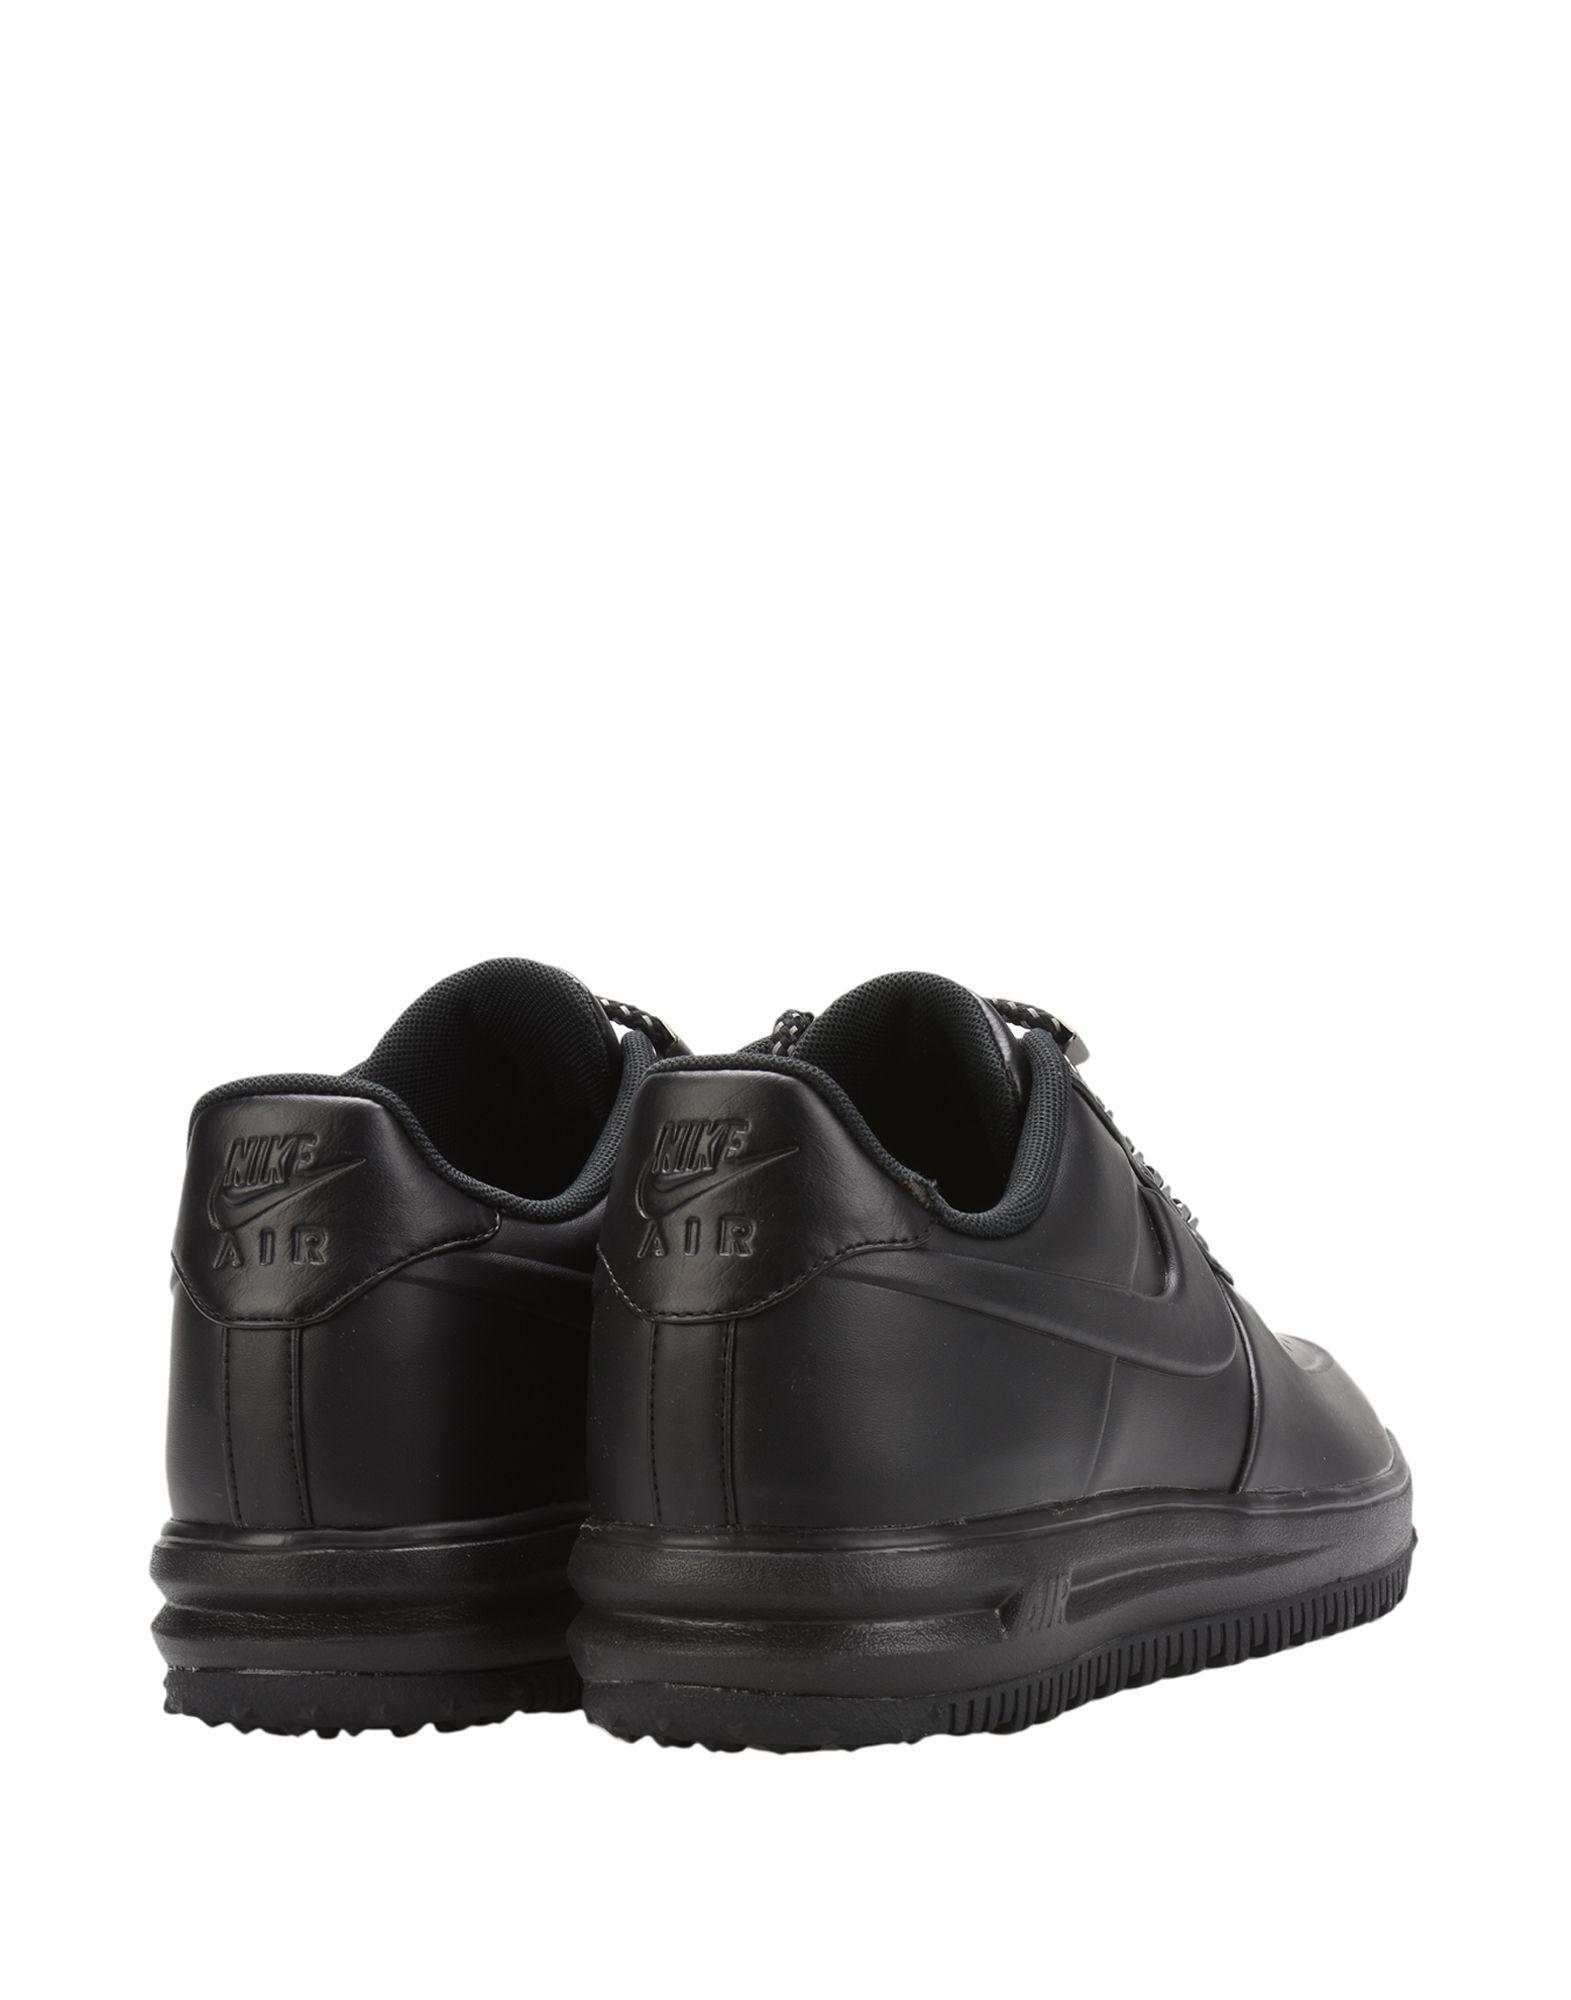 Nike Lf1 Duckboot Low 11407256JF  11407256JF Low 63333c